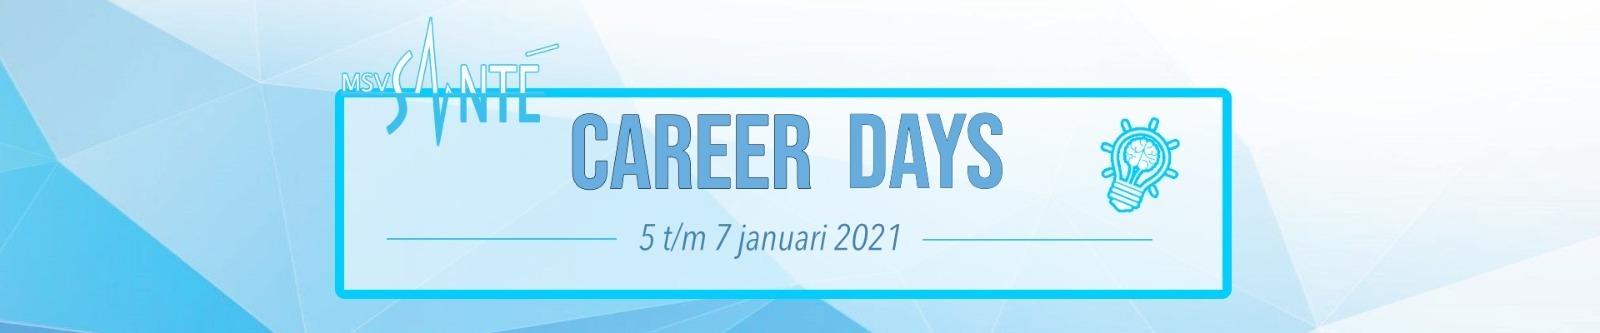 MSV Santé Career Days